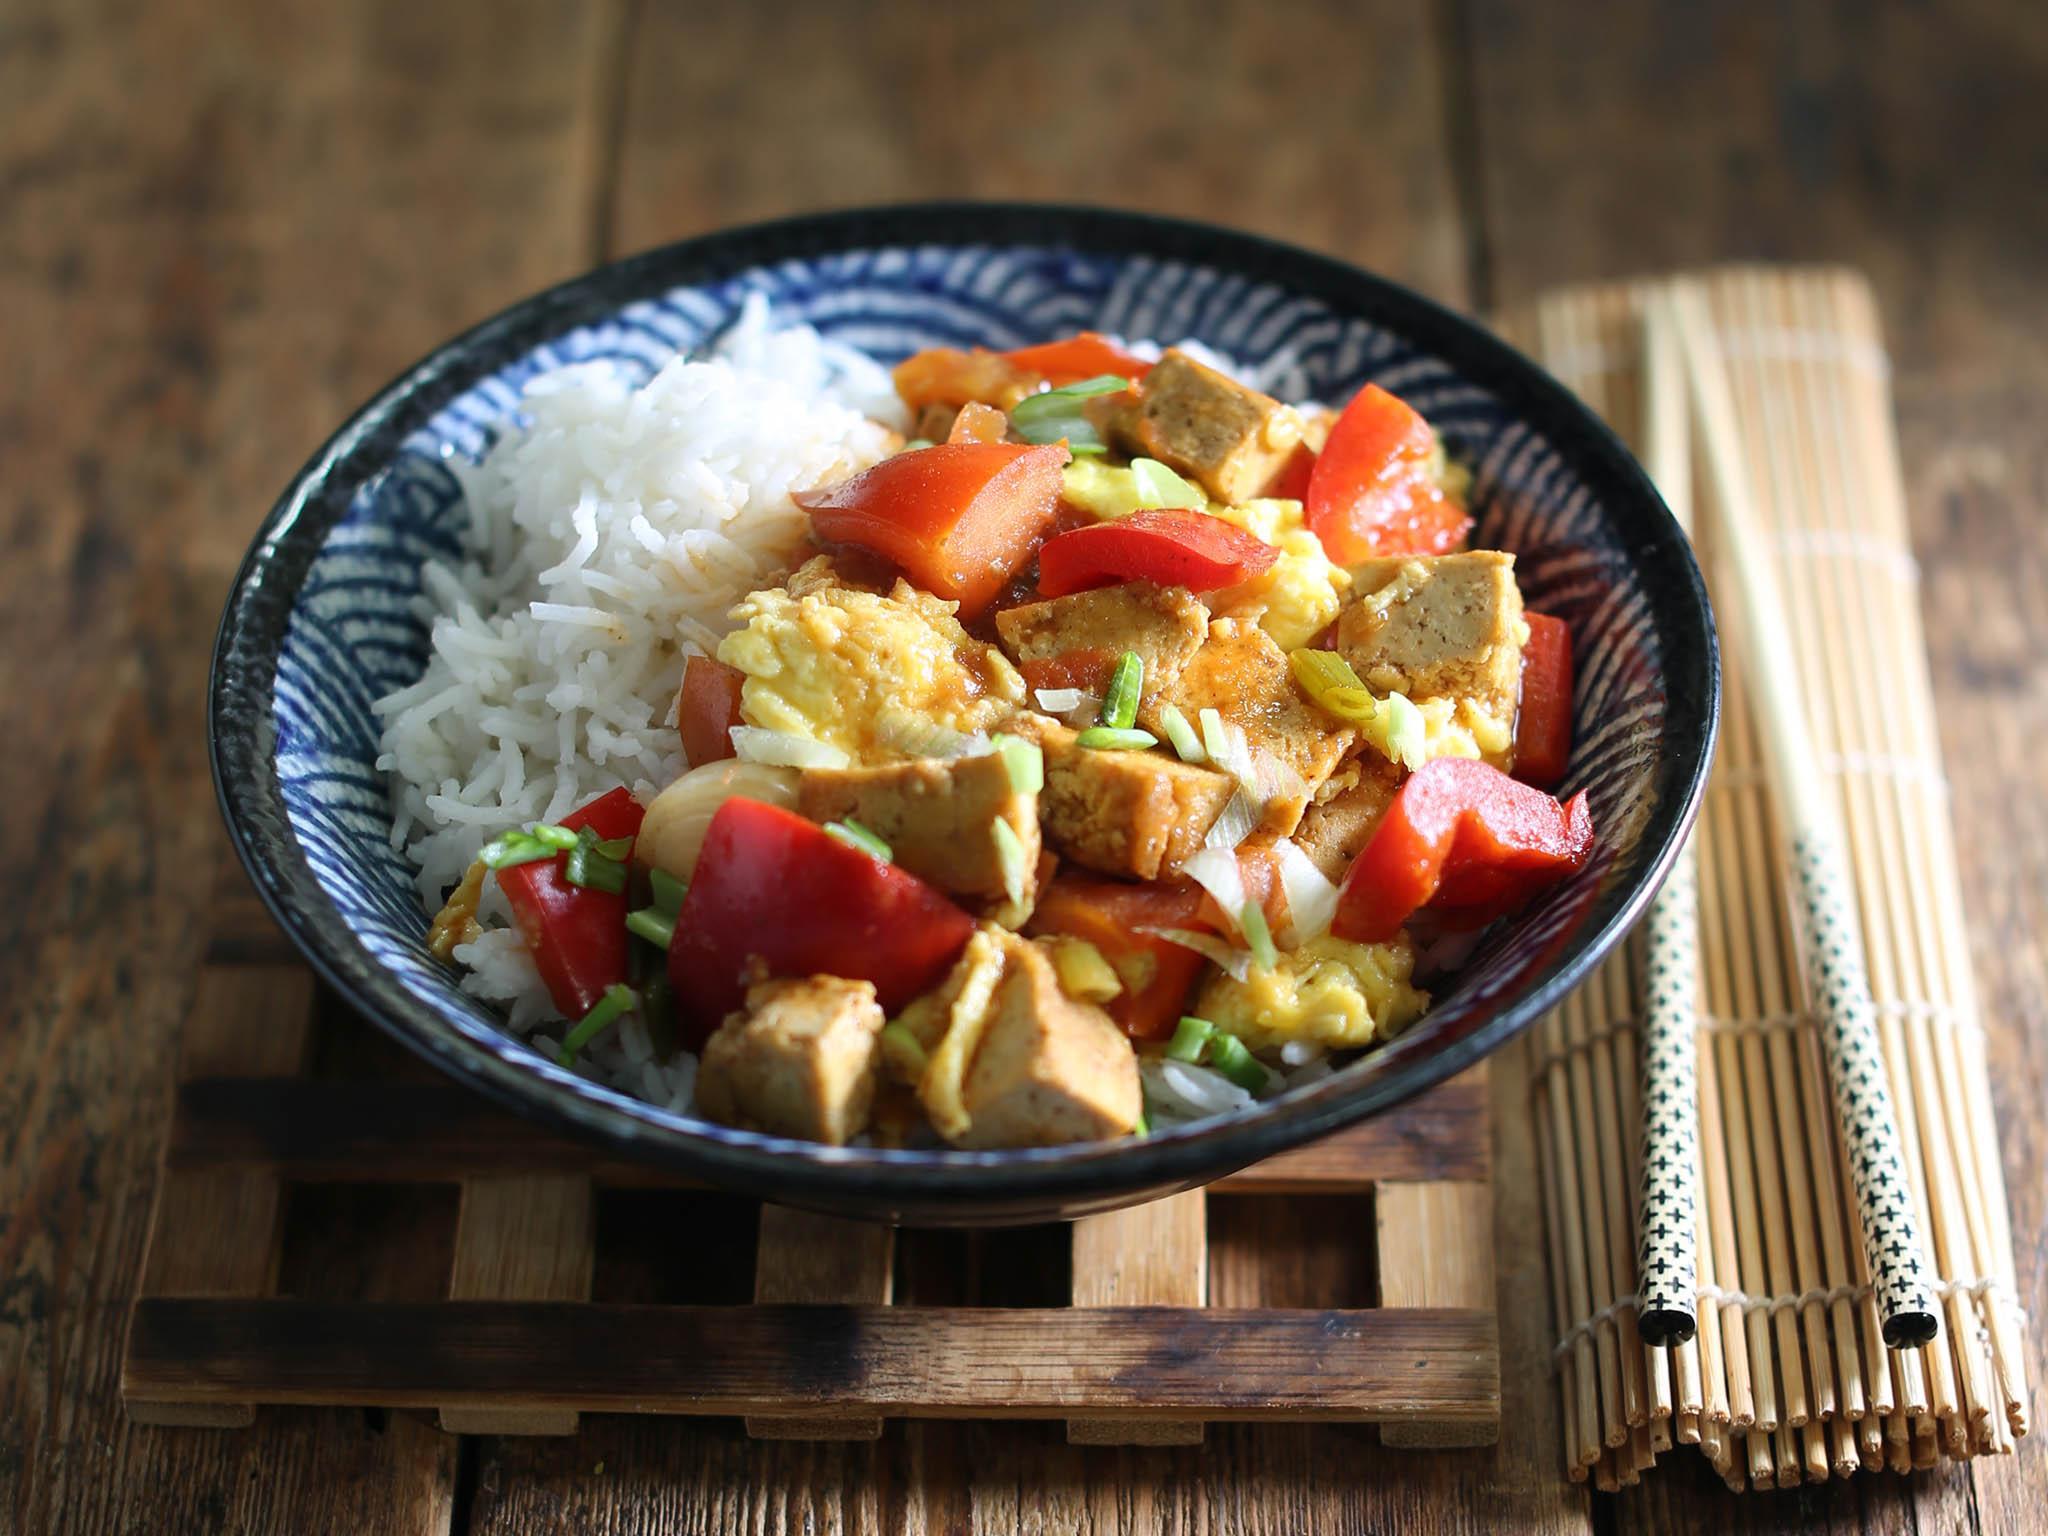 How to make tomato, tofu and egg stir-fry 1